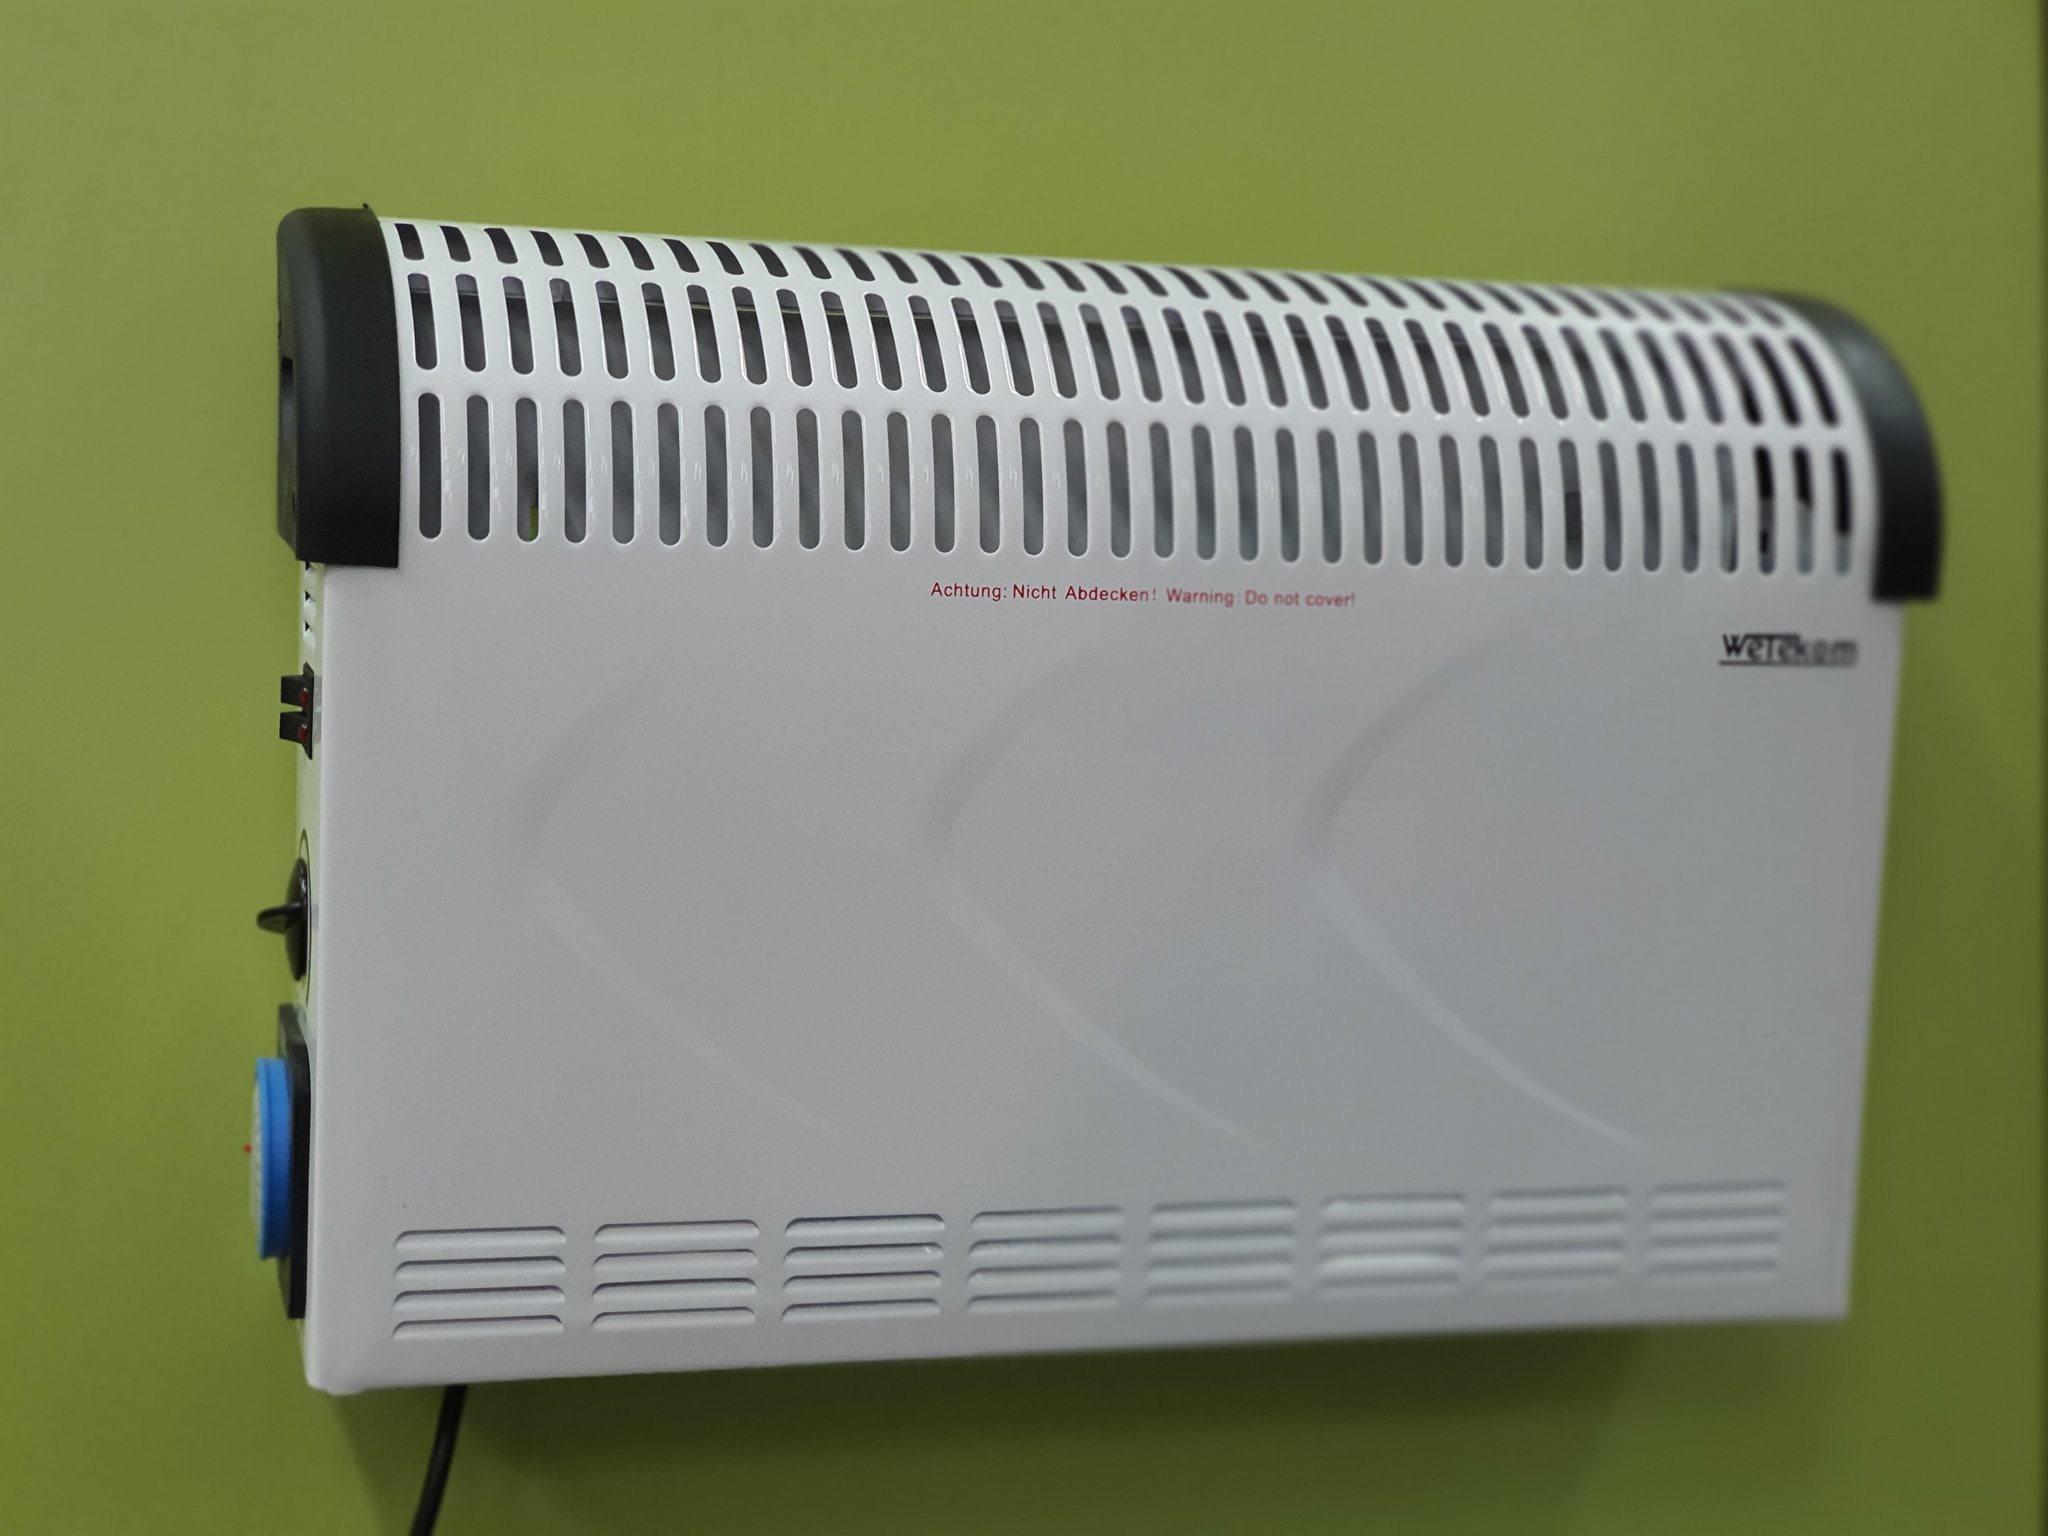 WeTekom konvertor Grijalica 2000w